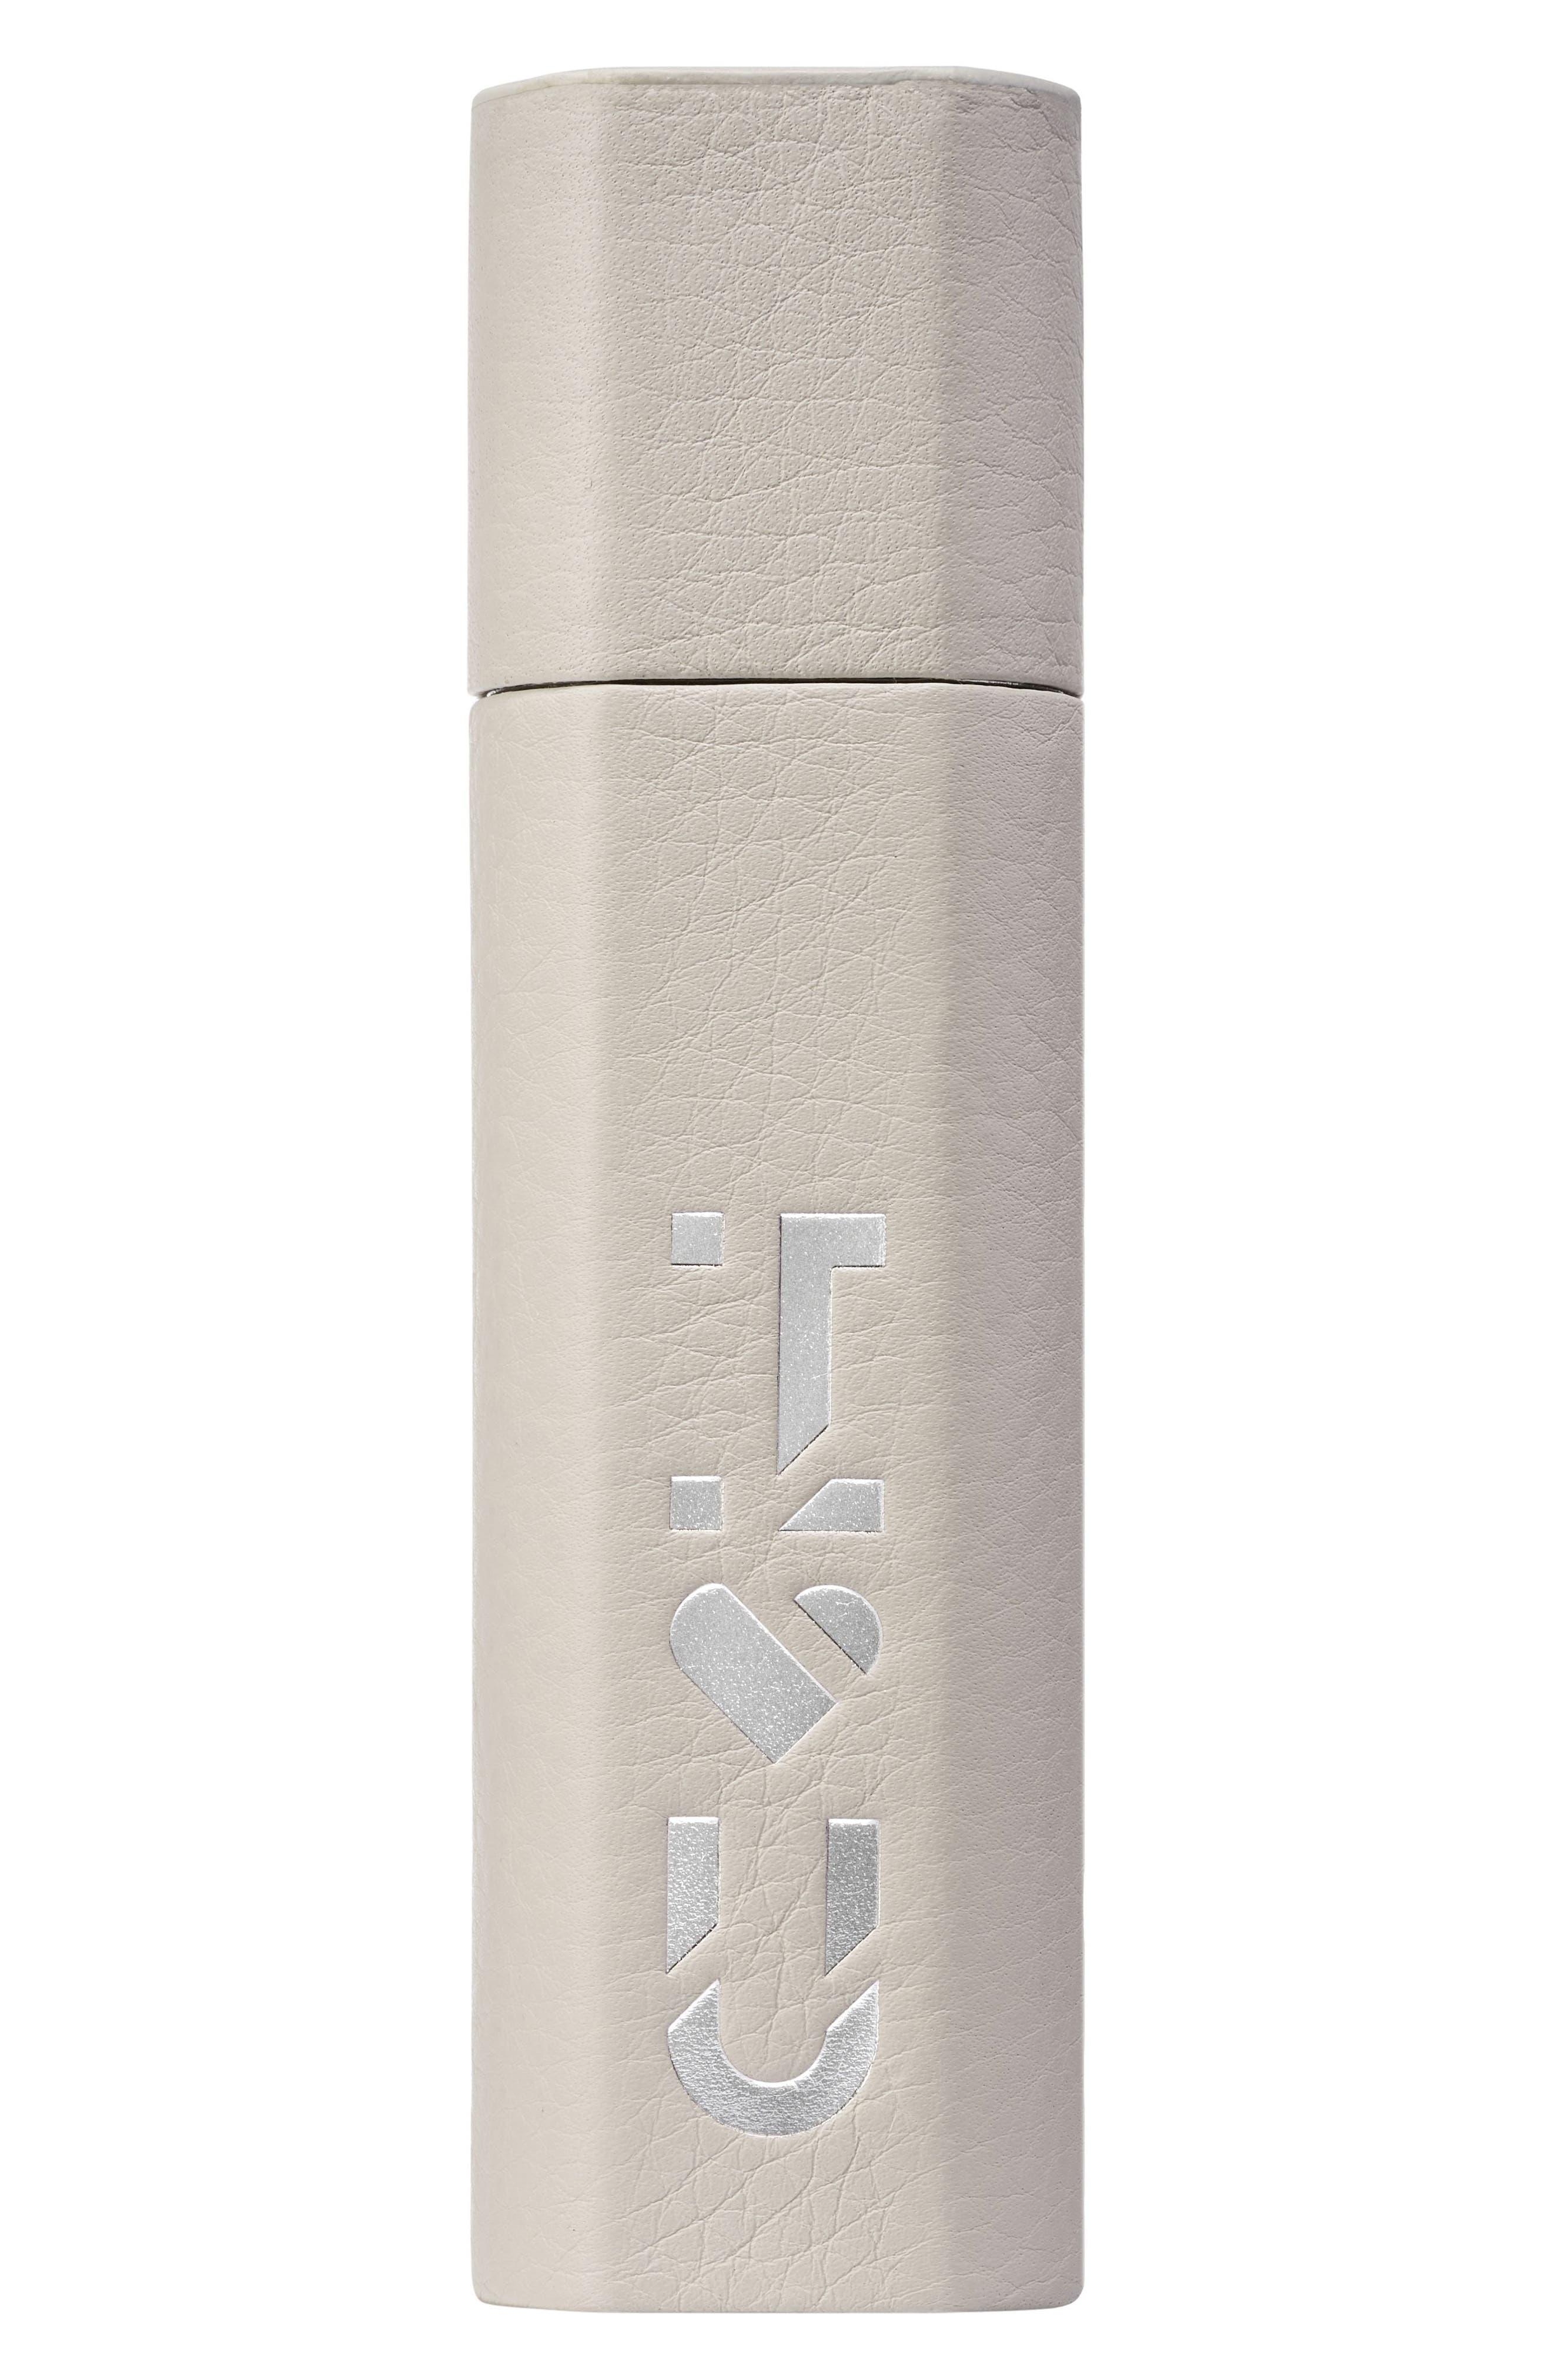 Main Image - BYREDO I Love You Travel Spray Case (Limited Edition)